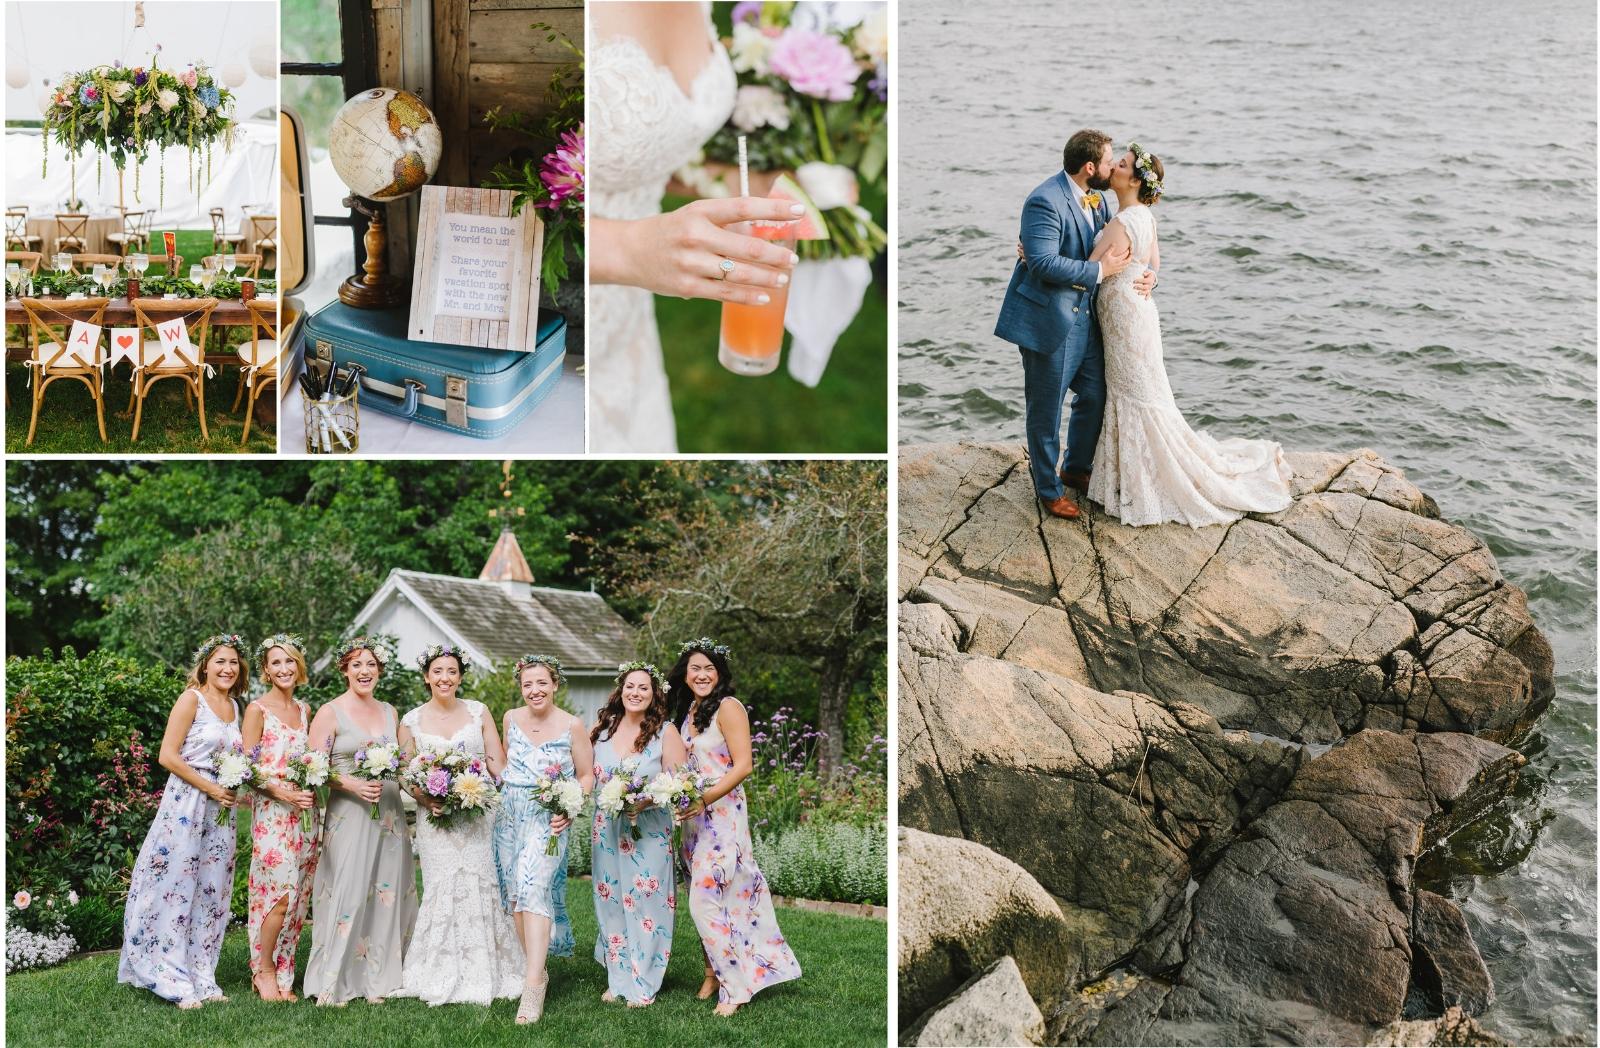 Andy + Wes - Romantic Seaside wedding at Mount Hope Farm, Bristol, Rhode Island